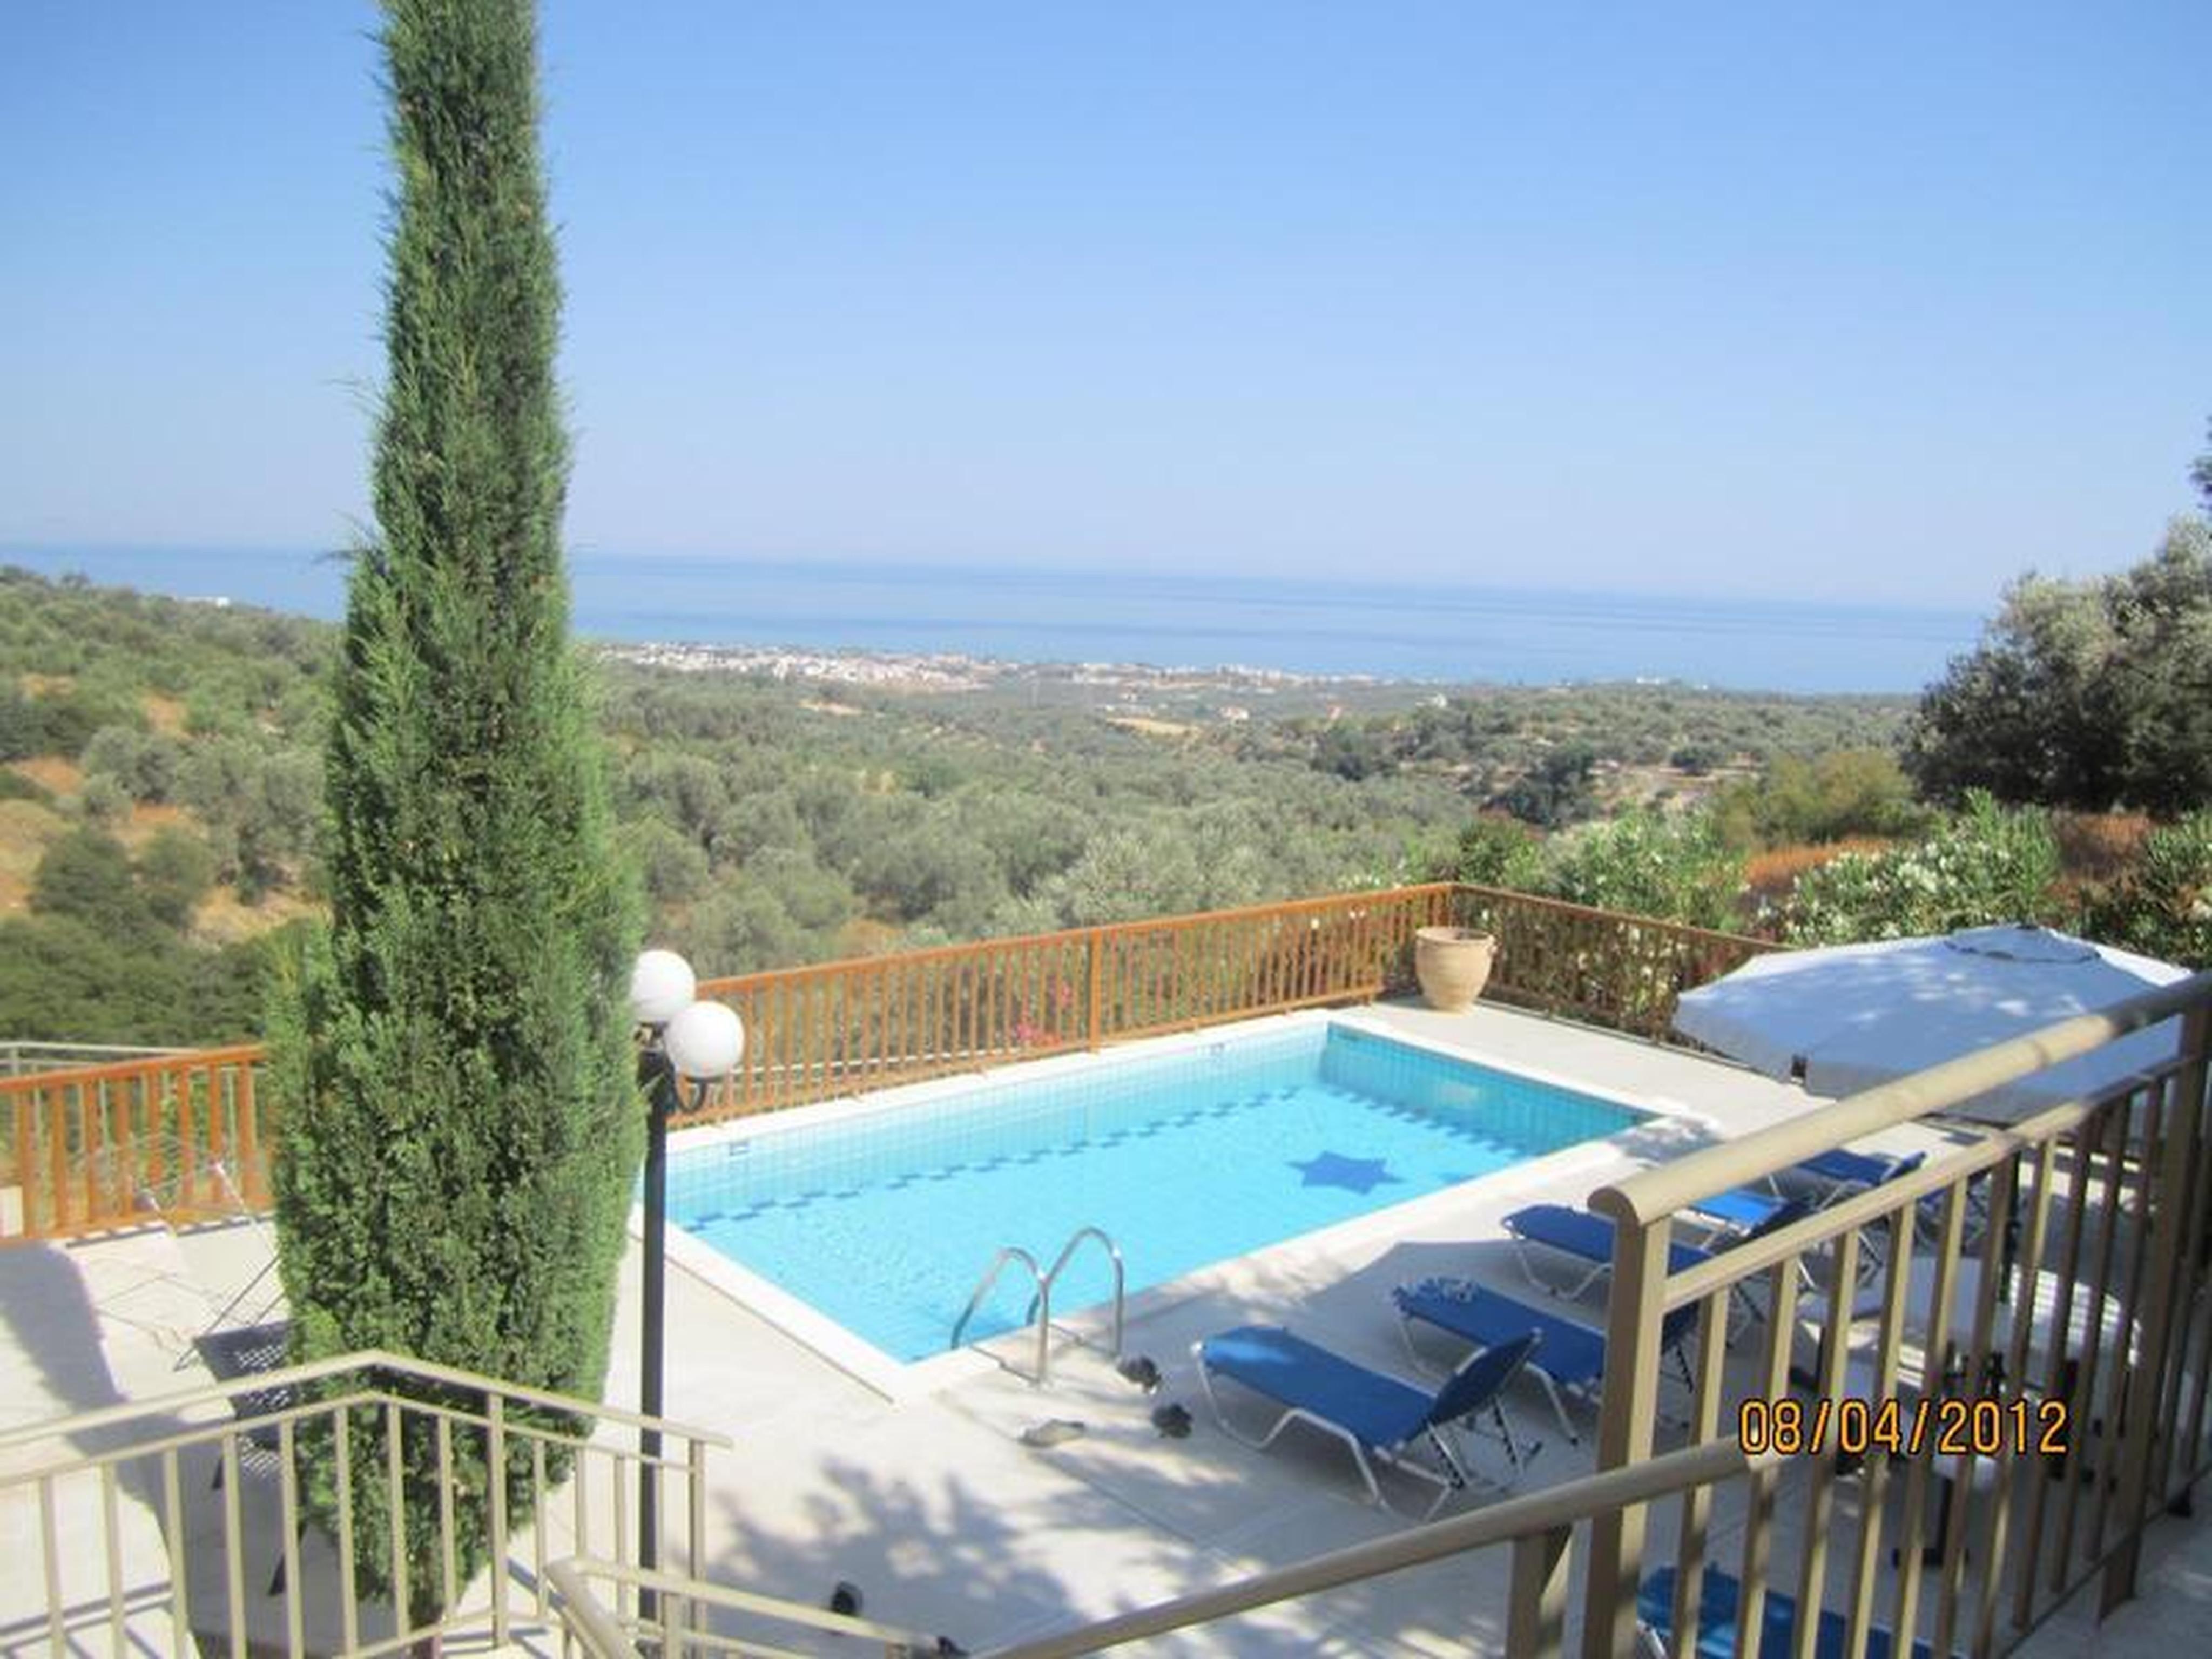 Schones Ferienhaus fur 10 Personen, mit Pool Villa  Kreta